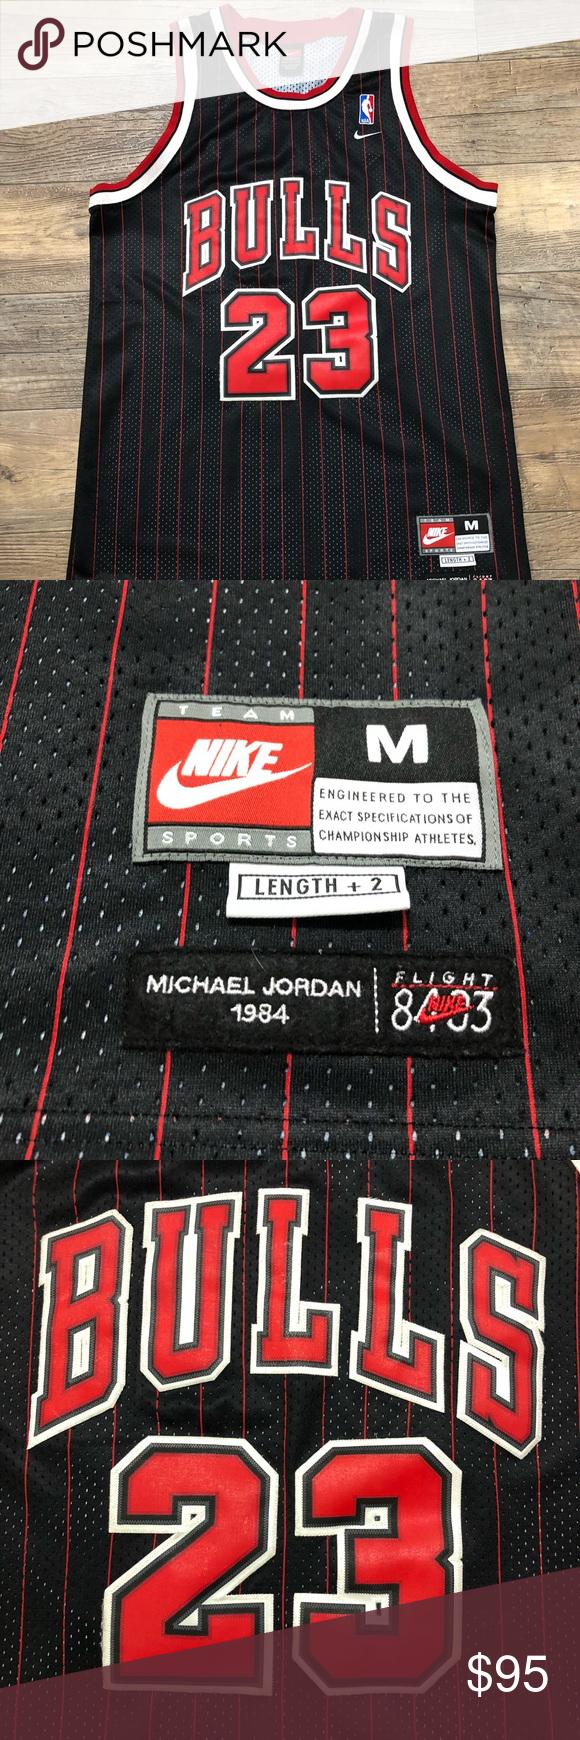 e5bf25ca32b Men's Nike Michael Jordan Chicago Bulls Jersey Men's NIKE SEWN MICHAEL  JORDAN #23 CHICAGO BULLS Pinstripes FLIGHT 8403 SWINGMAN NBA BASKETBALL  JERSEY.